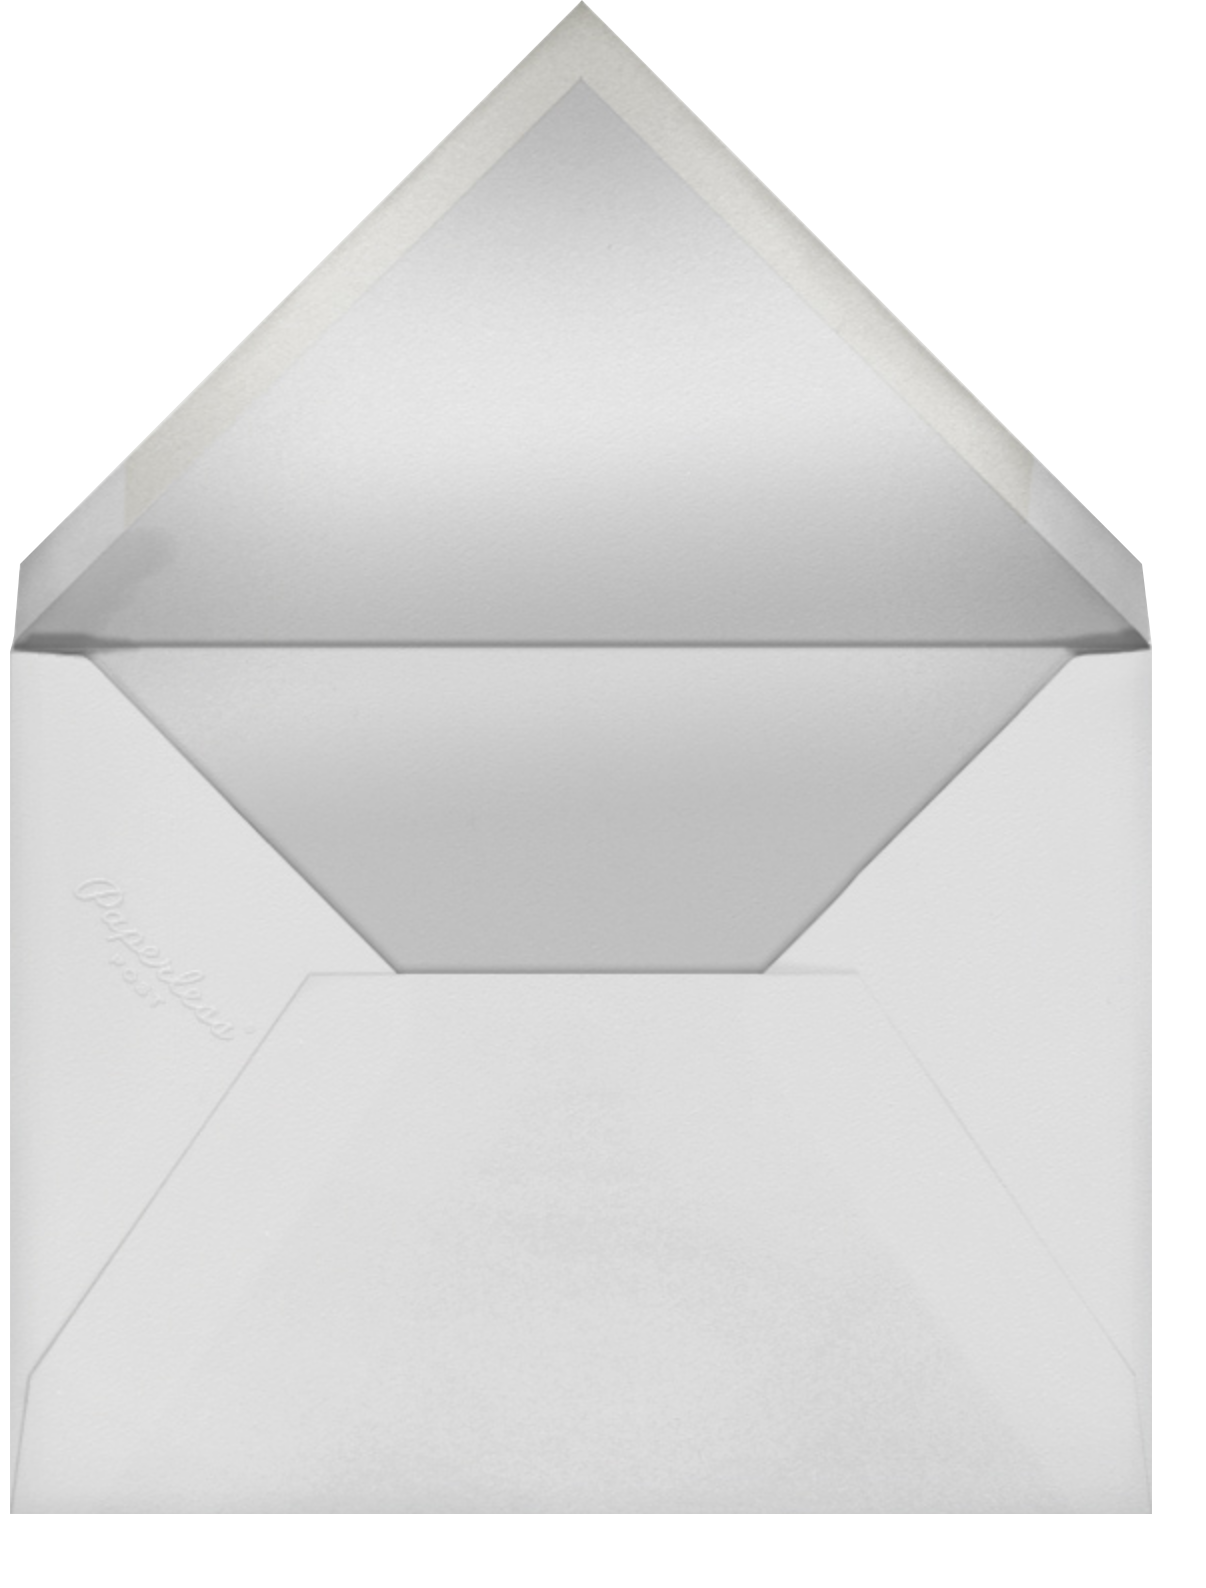 Josephine Baker (Menu) - Black/Gold - Paperless Post - Menus - envelope back